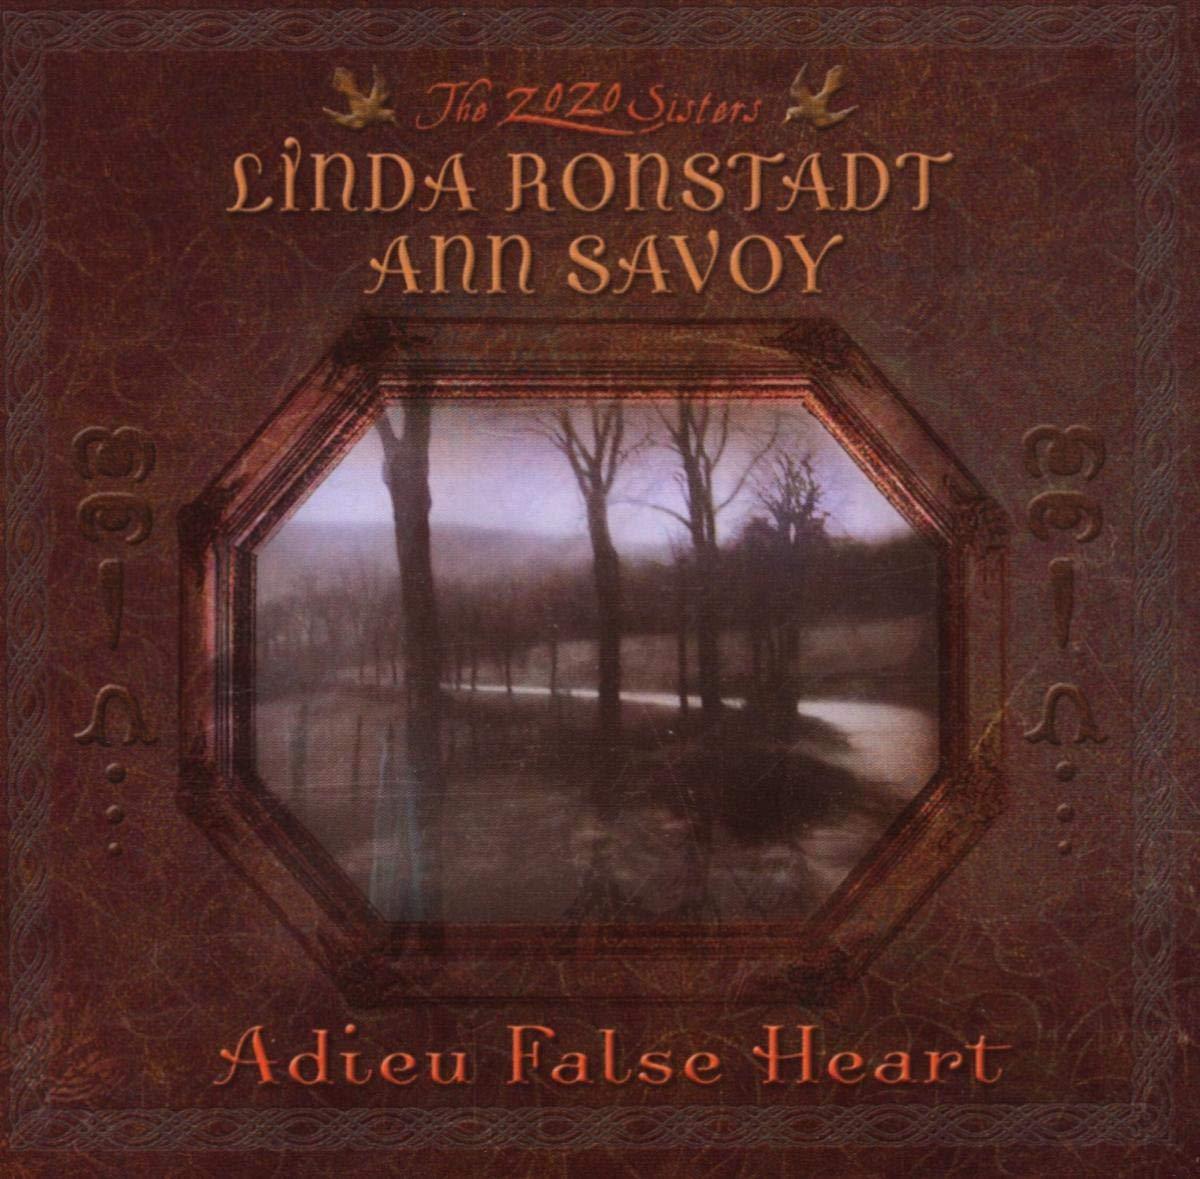 Adieu False Heart-Linda Ronstadt-Ann Savoy